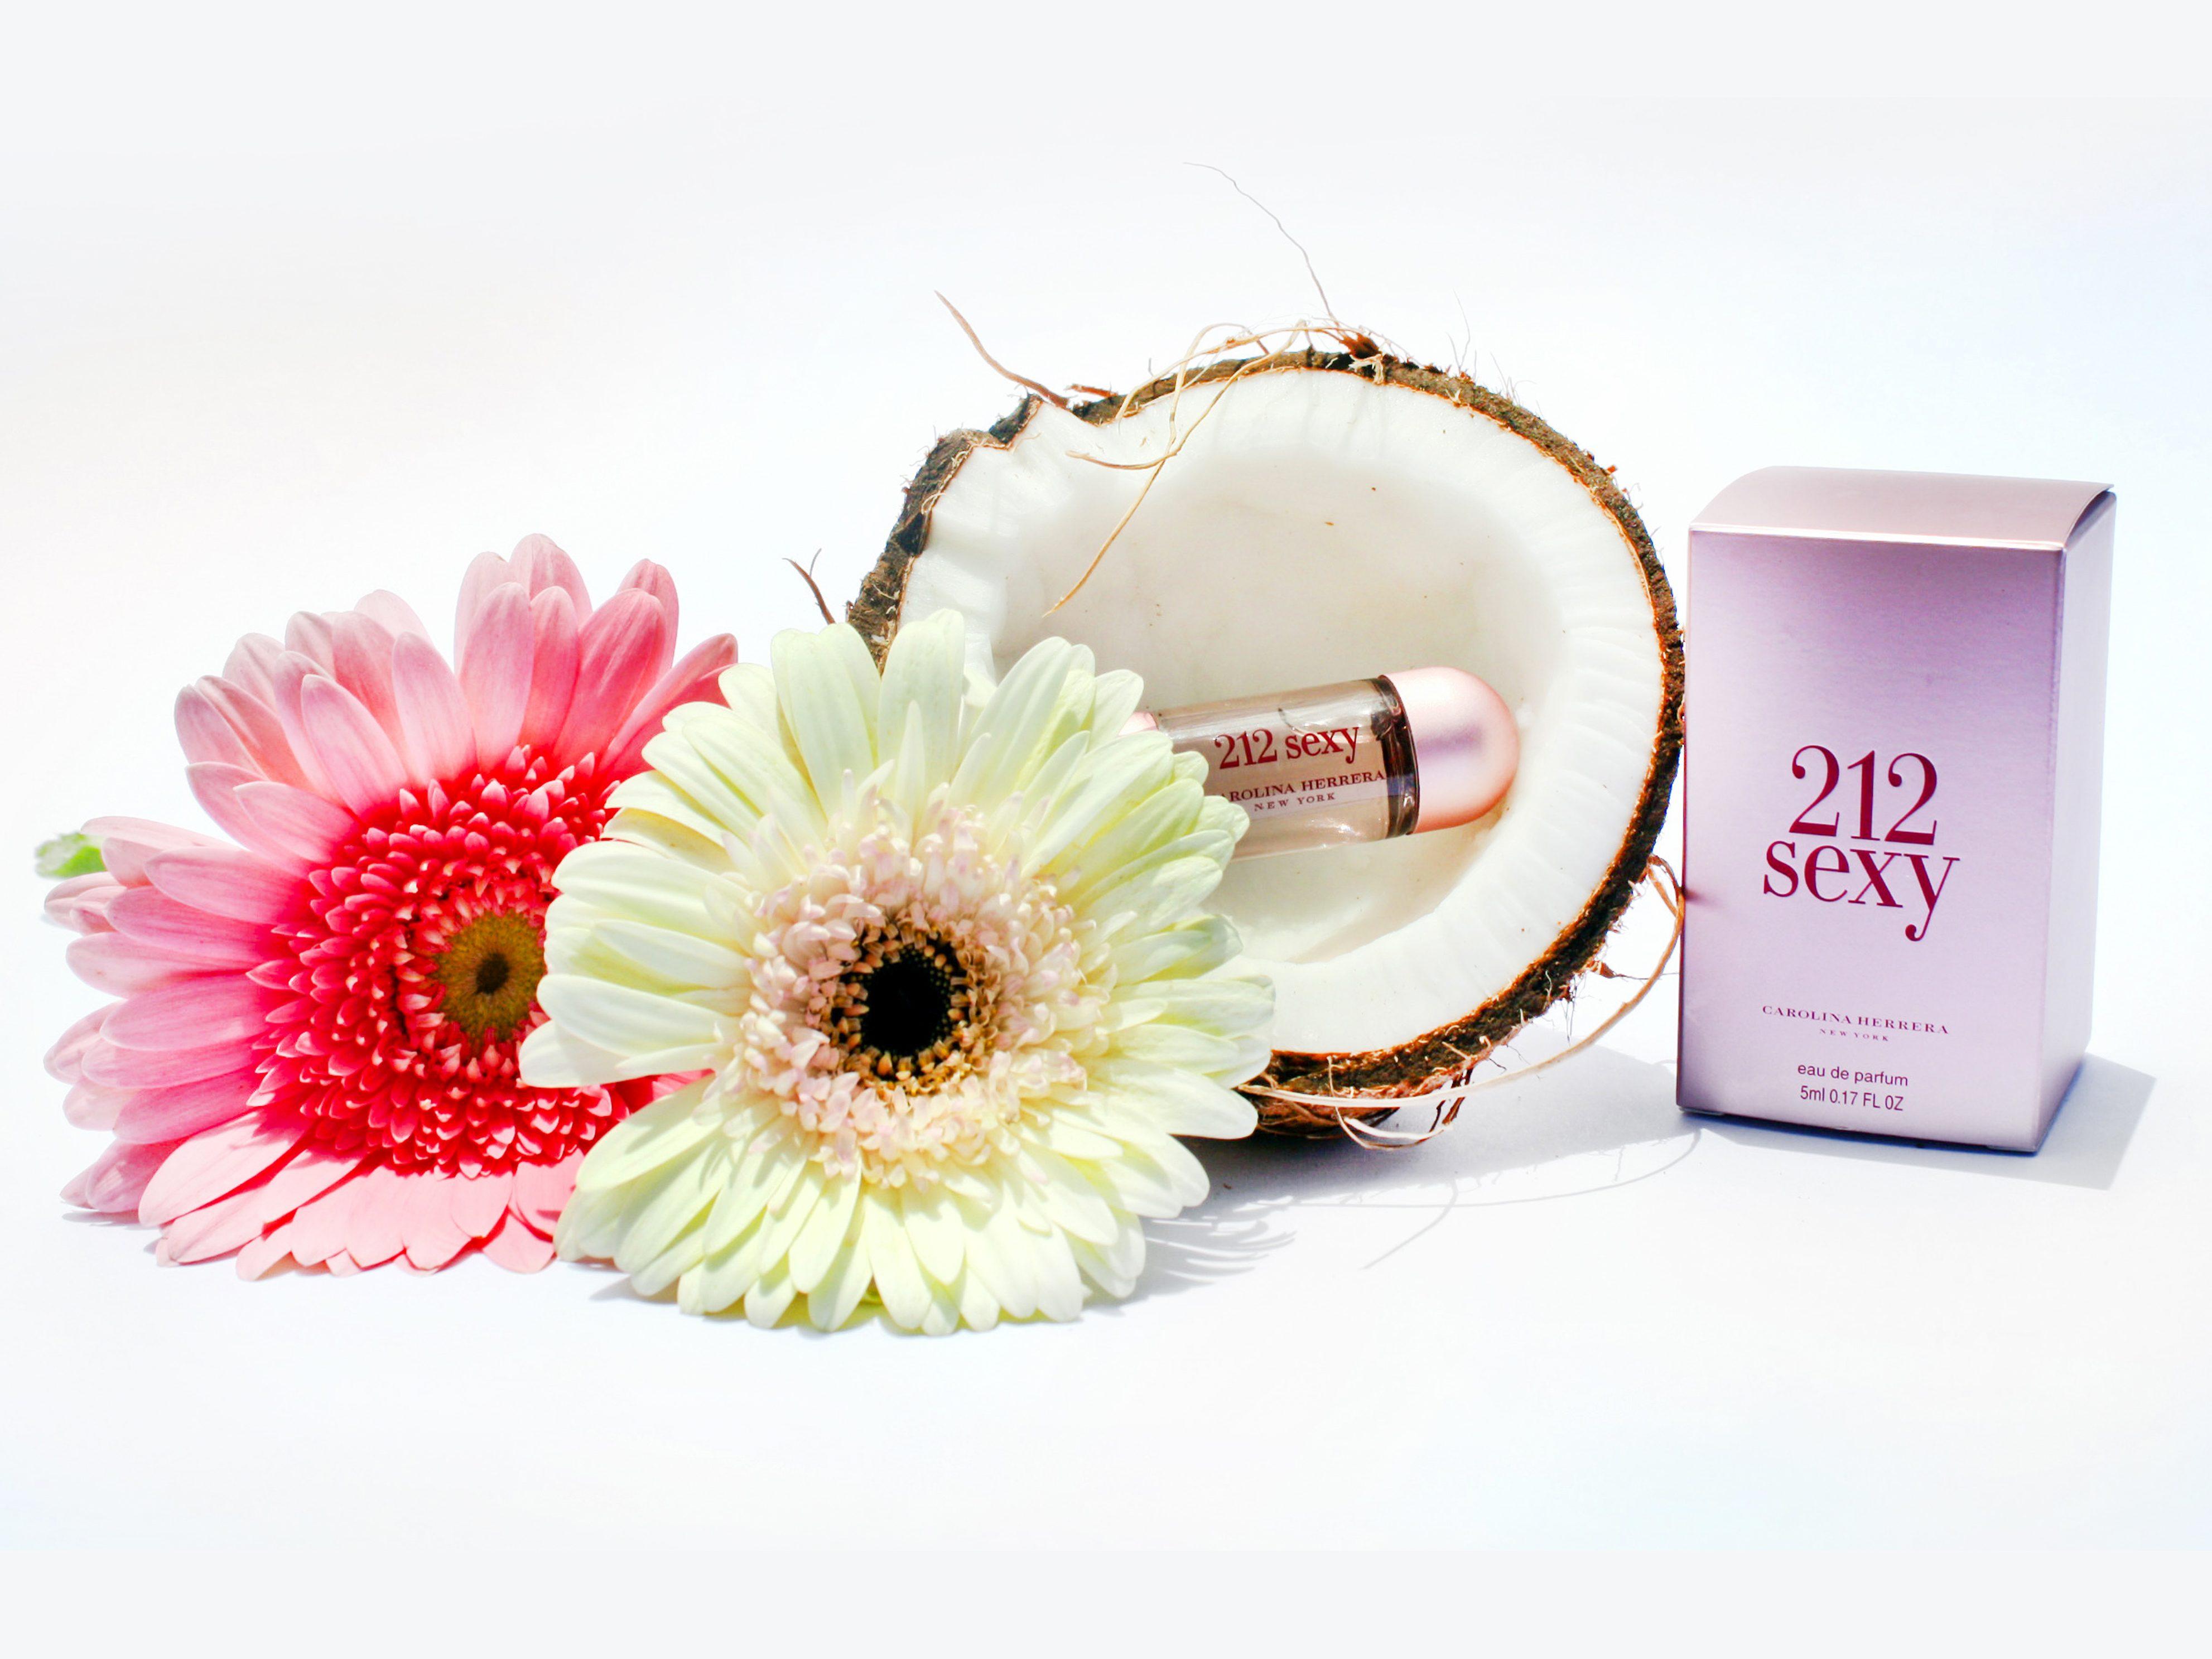 212 sexy perfume photoshot